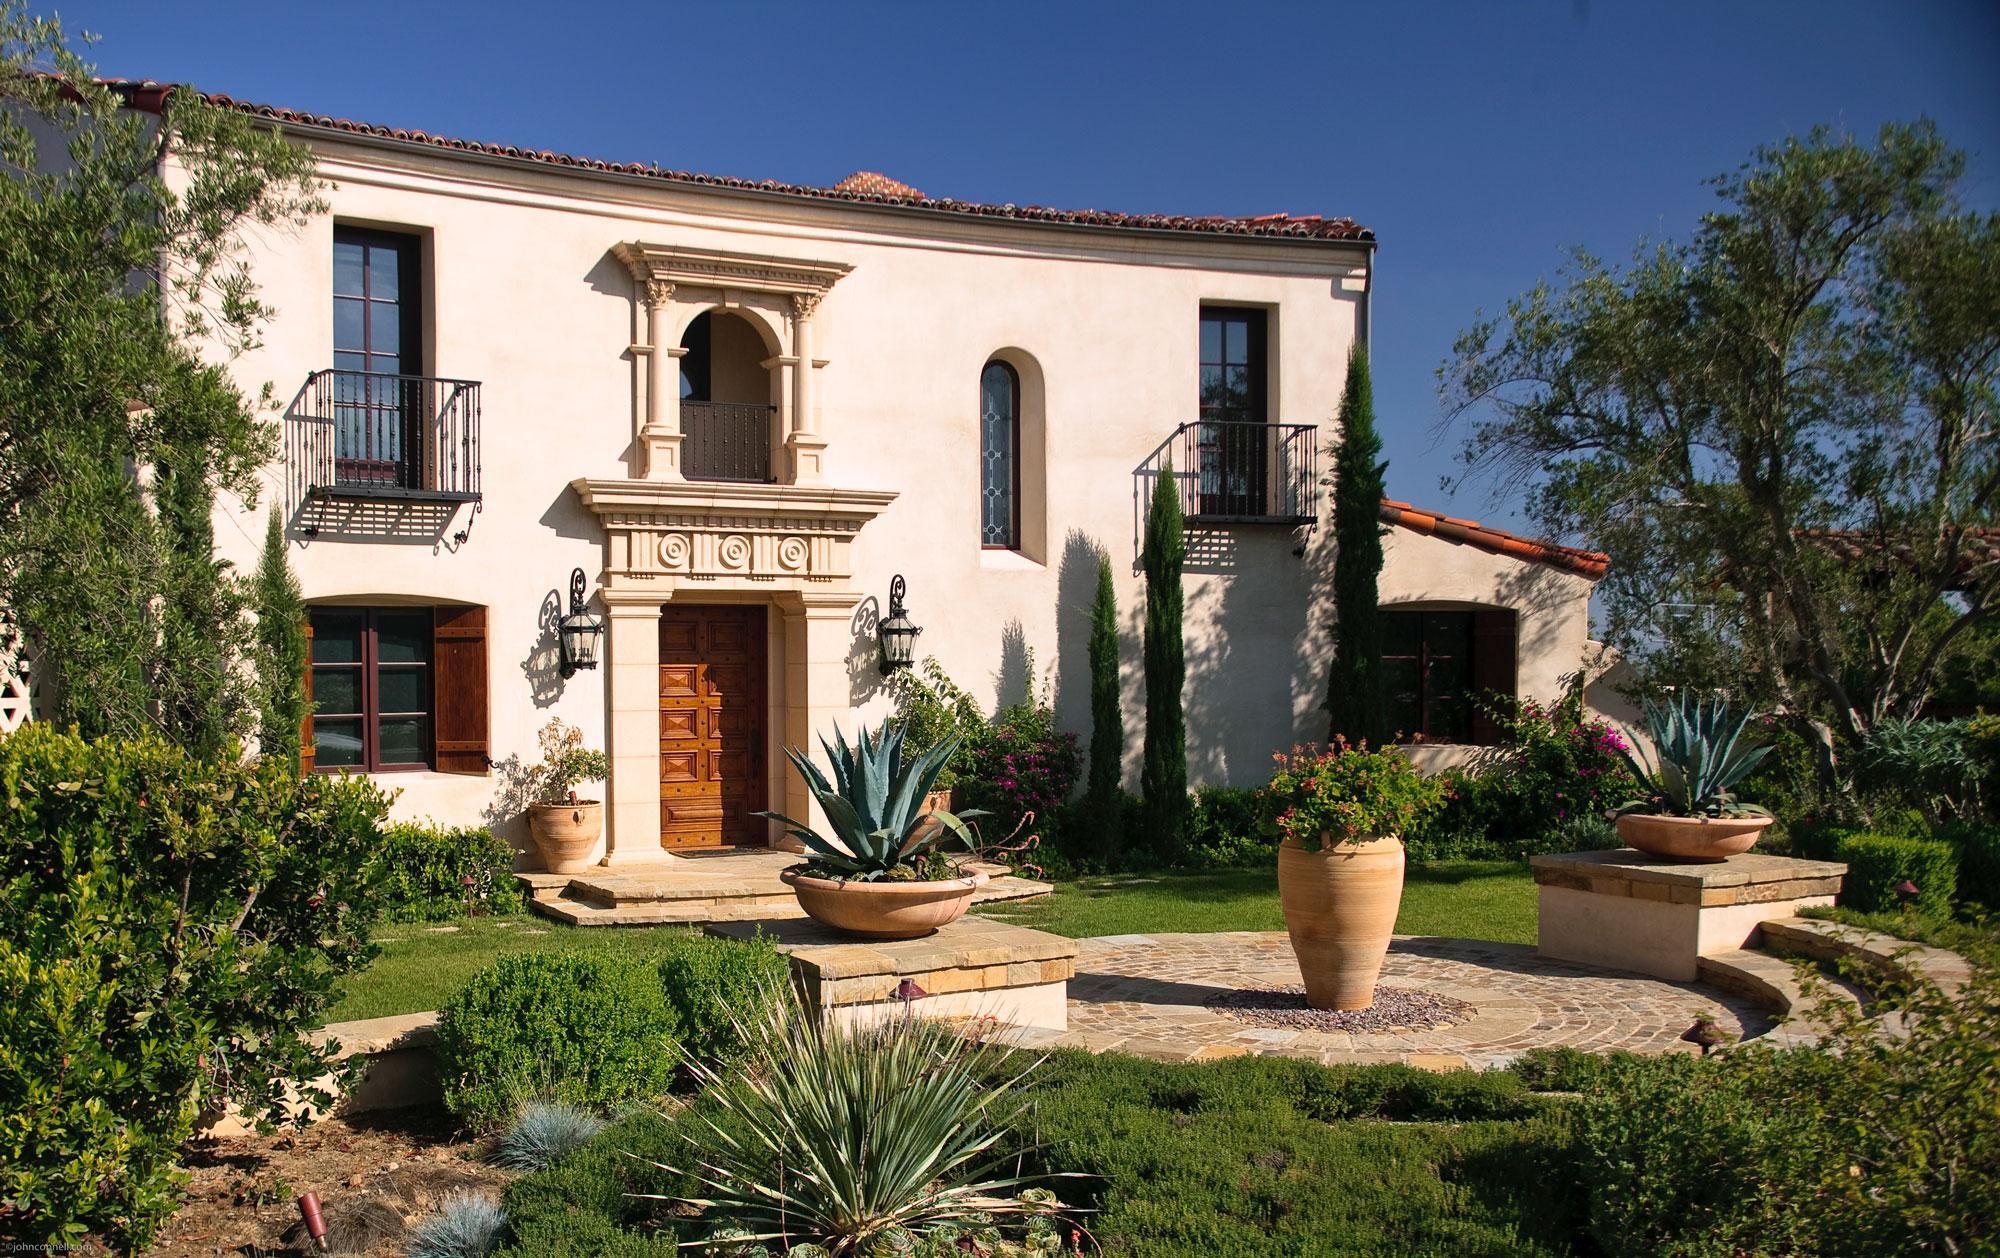 andalusian-revival-villa-front-exterior.jpg